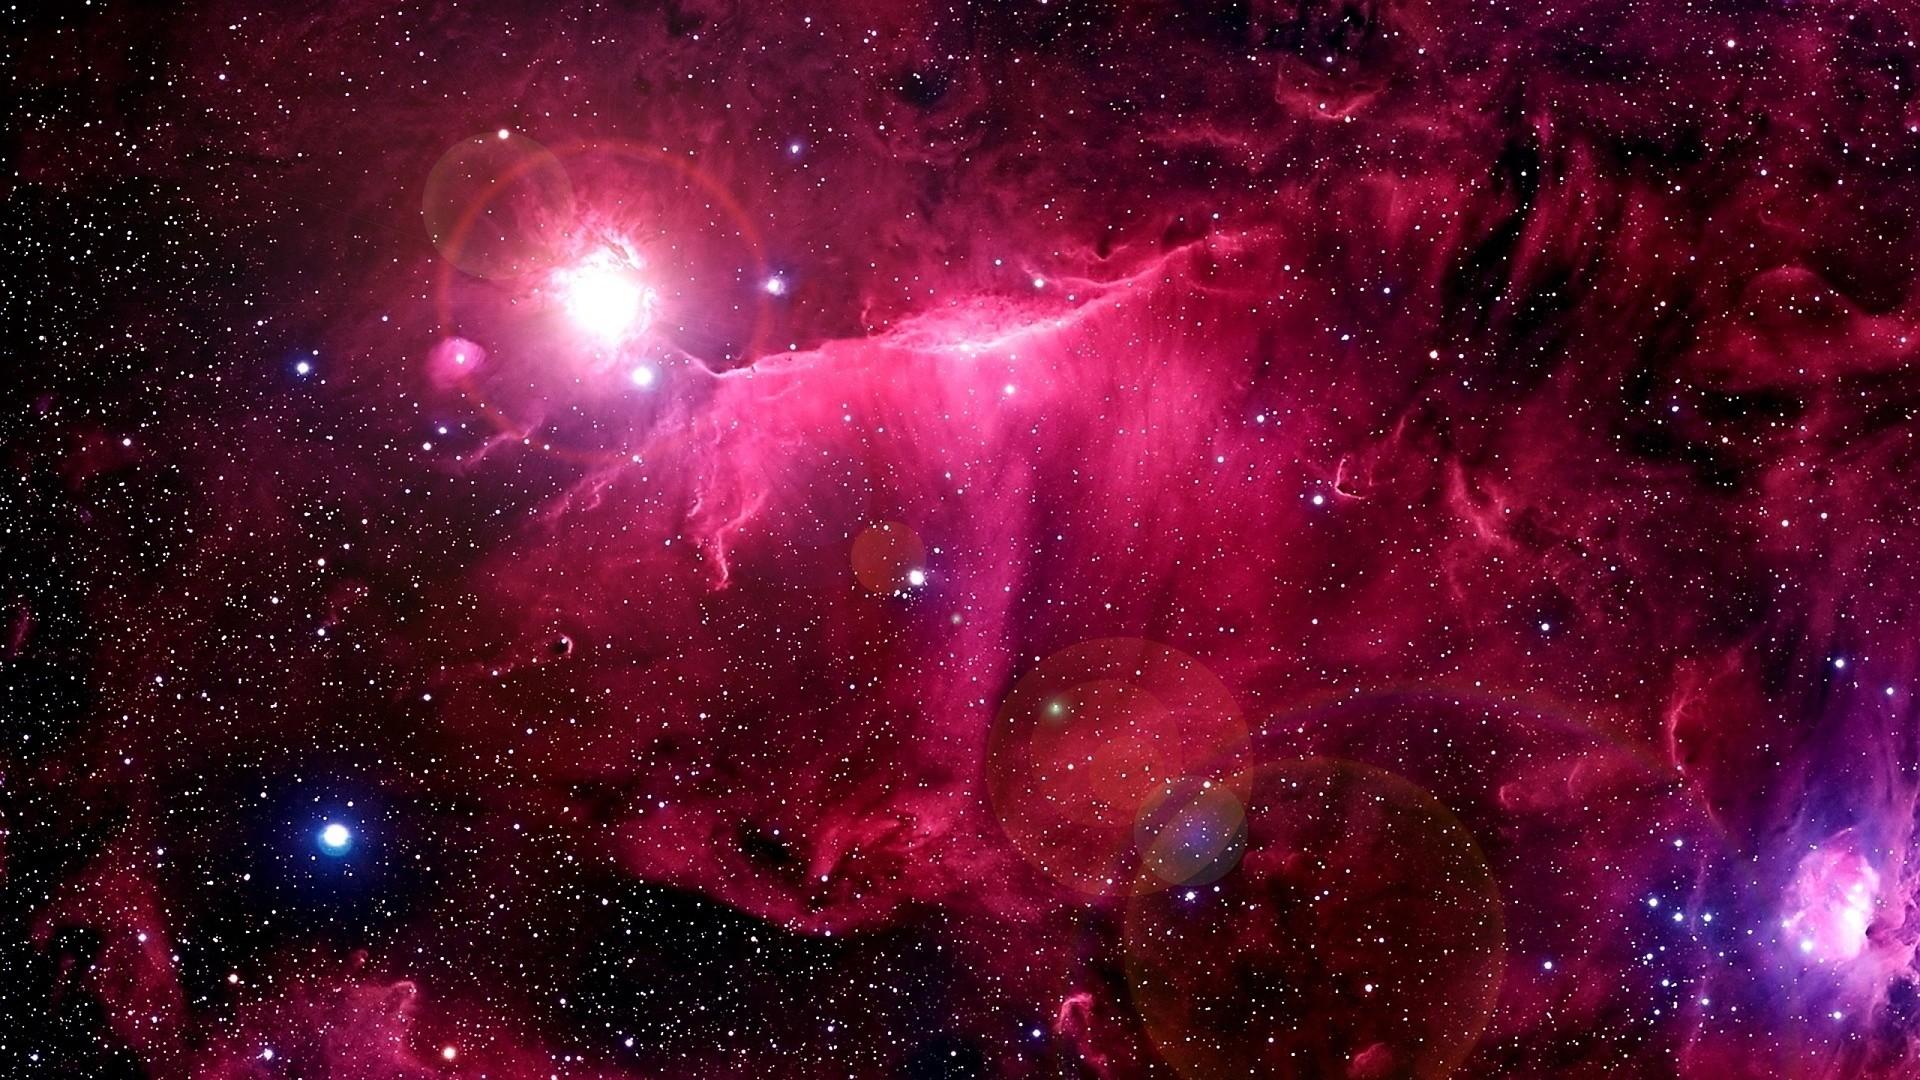 20 HD Nebula Desktop Wallpapers For Free Download